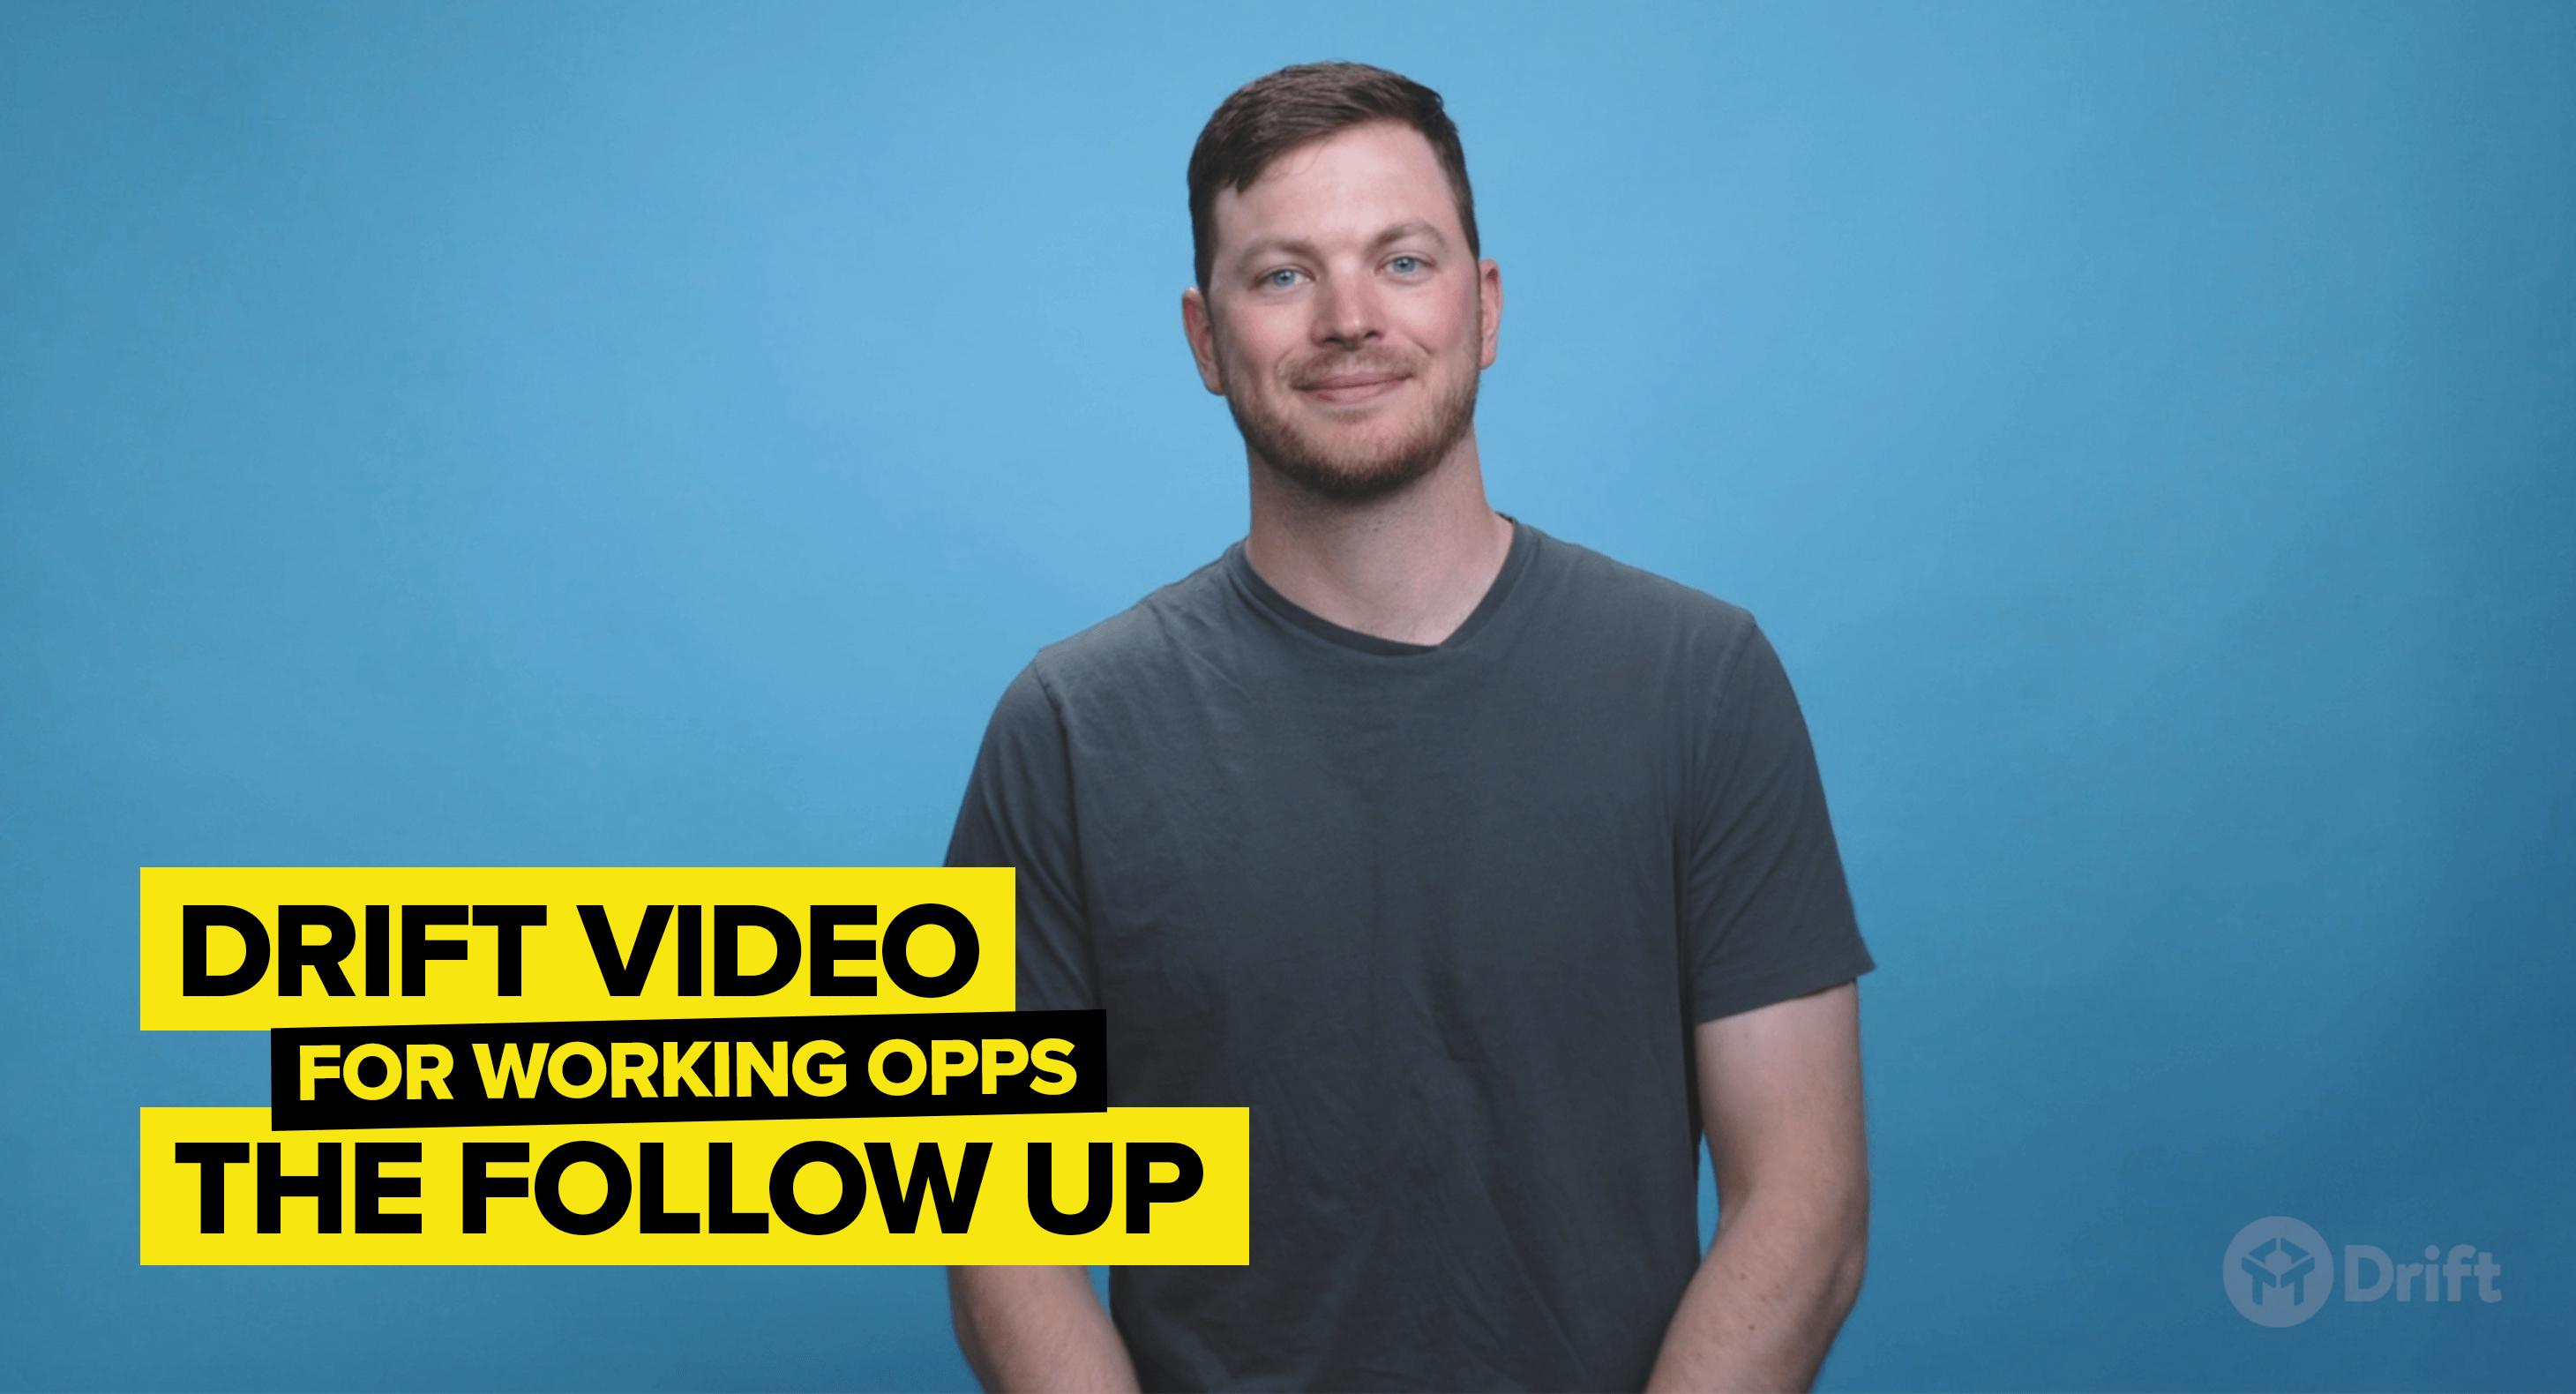 using Drift Video to work open sales opportunities